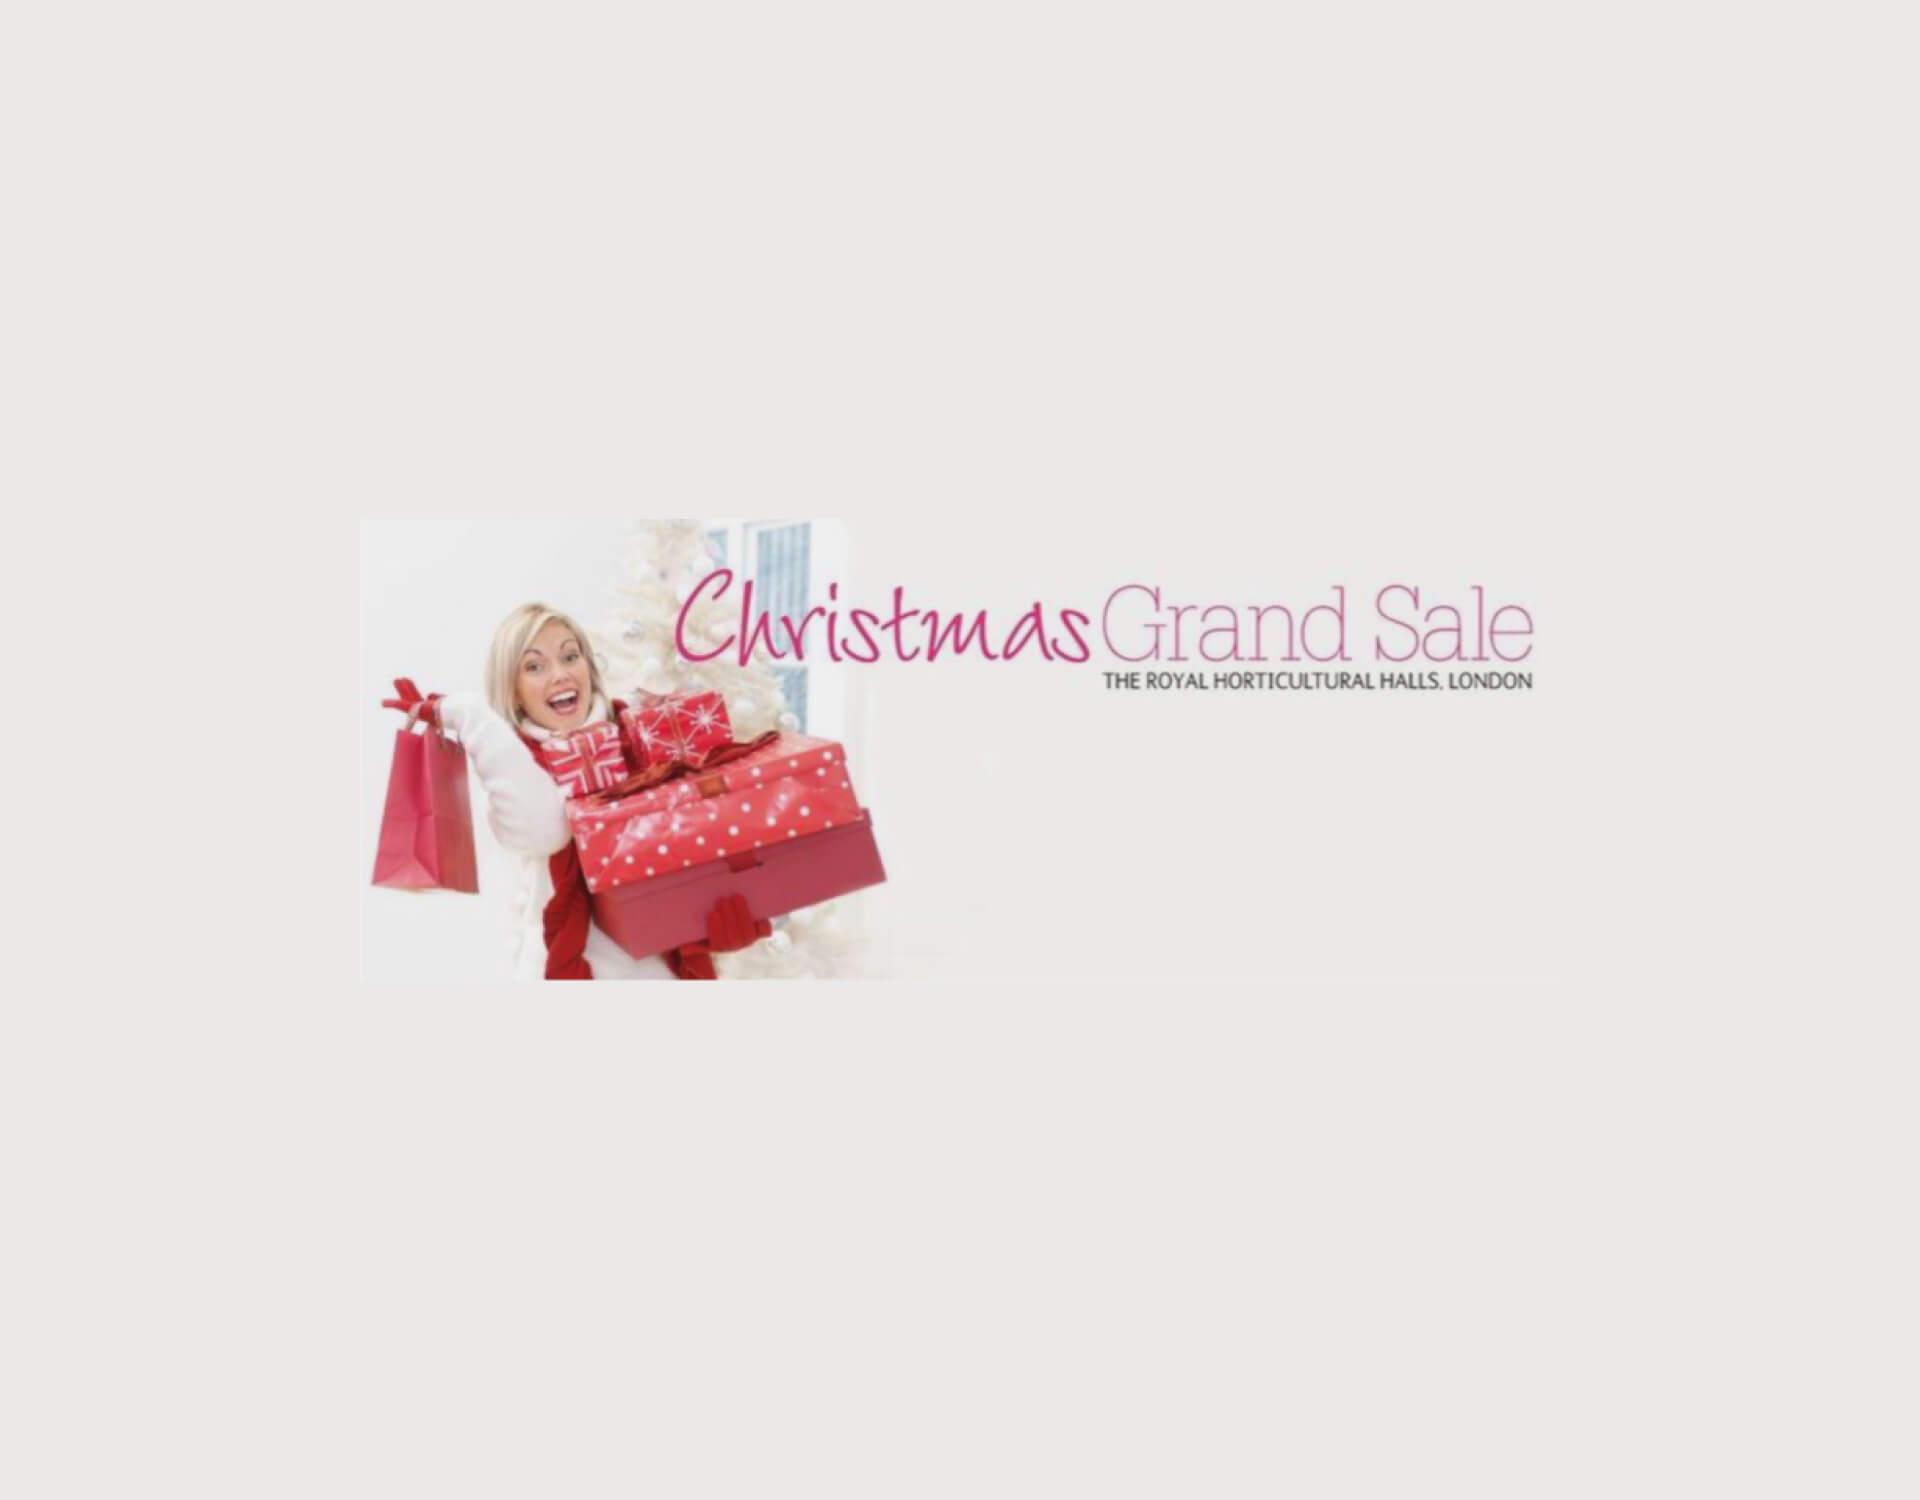 Christmas Grand Sales, London